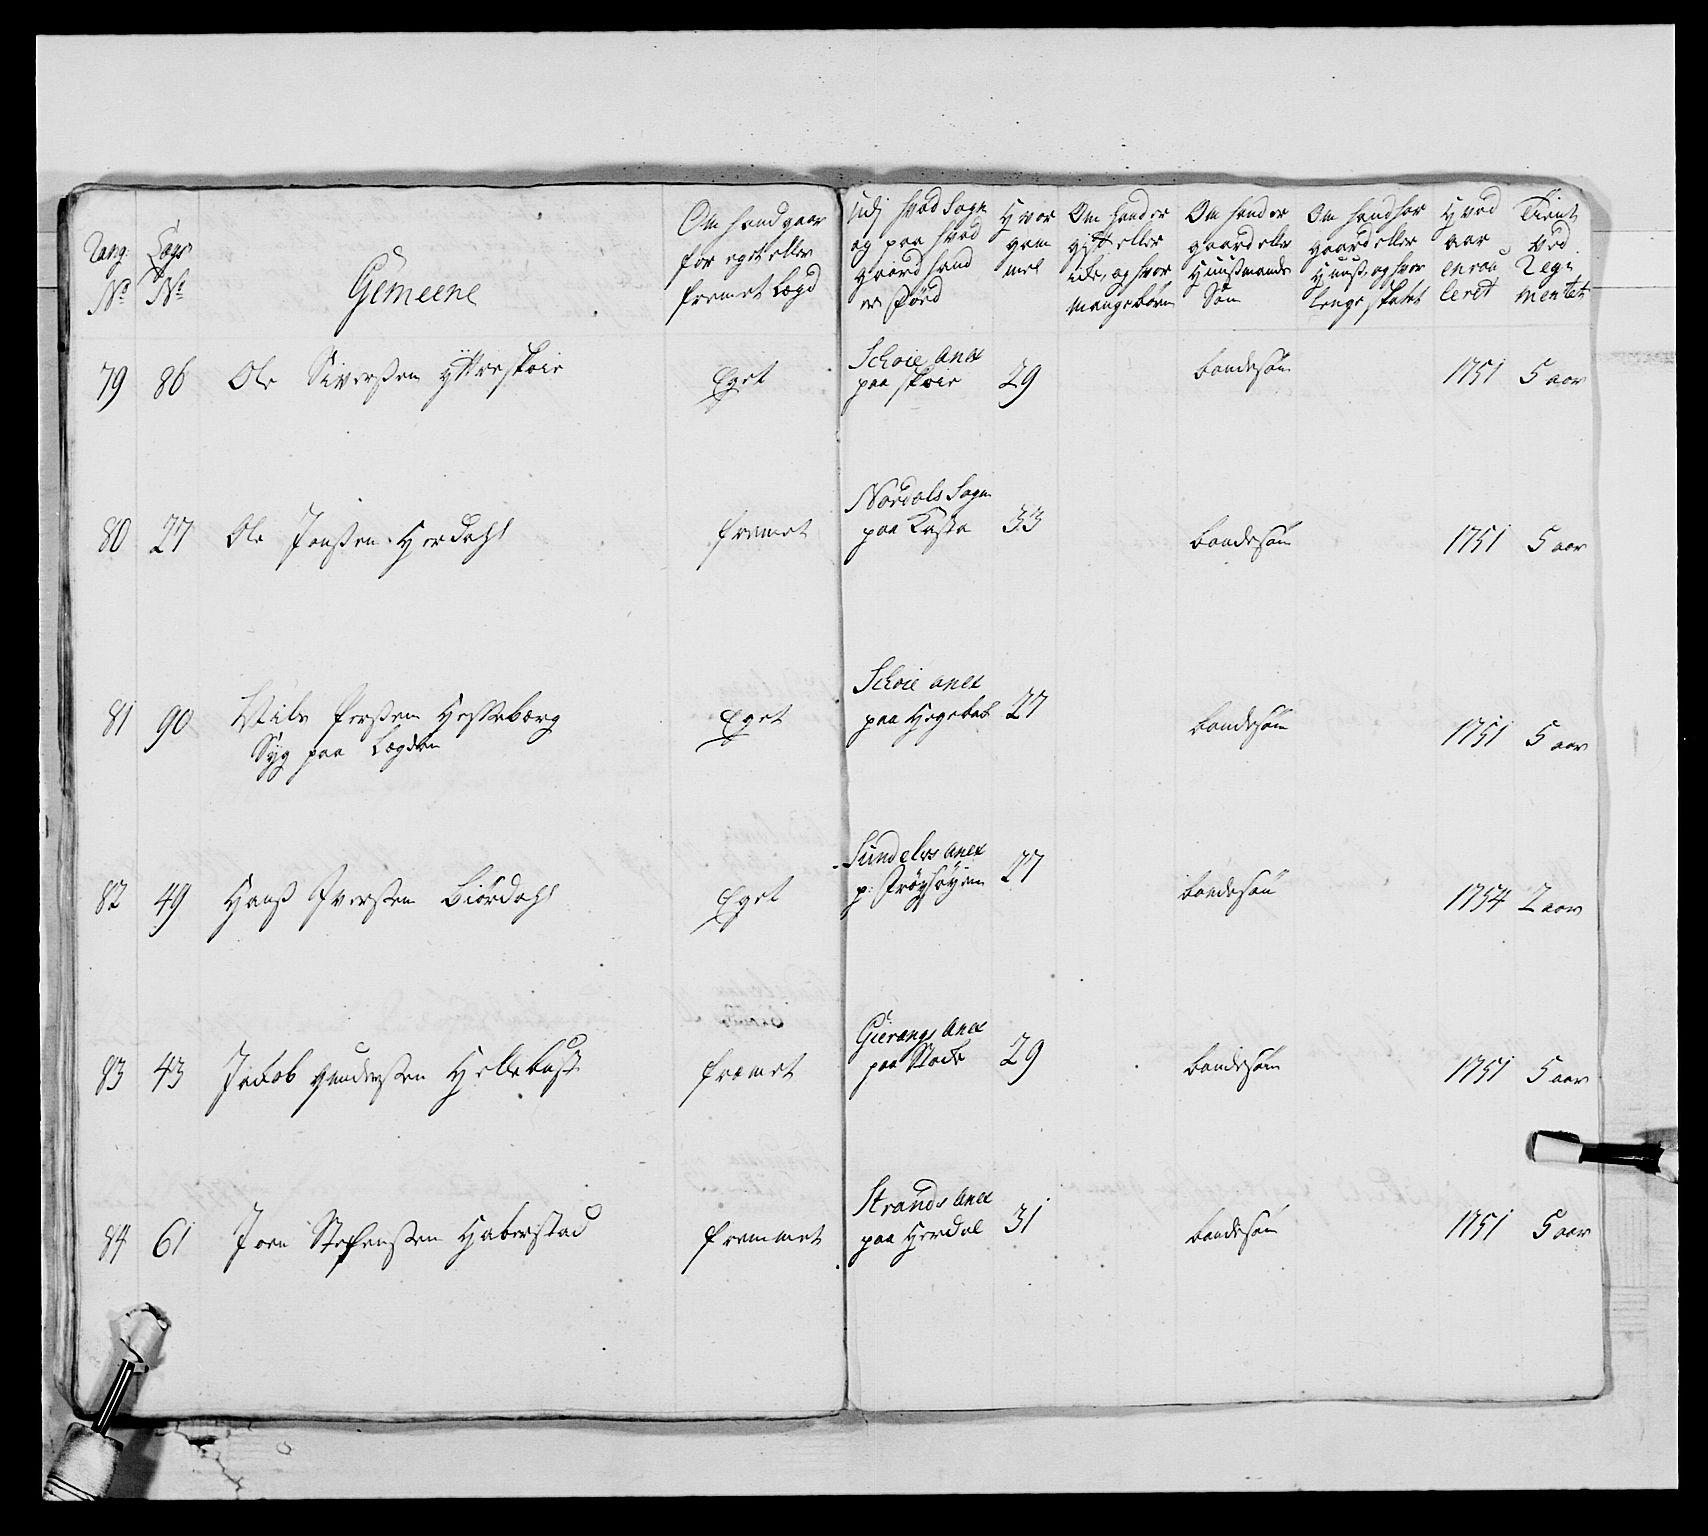 RA, Kommanderende general (KG I) med Det norske krigsdirektorium, E/Ea/L0517: 1. Bergenhusiske regiment, 1742-1756, s. 256